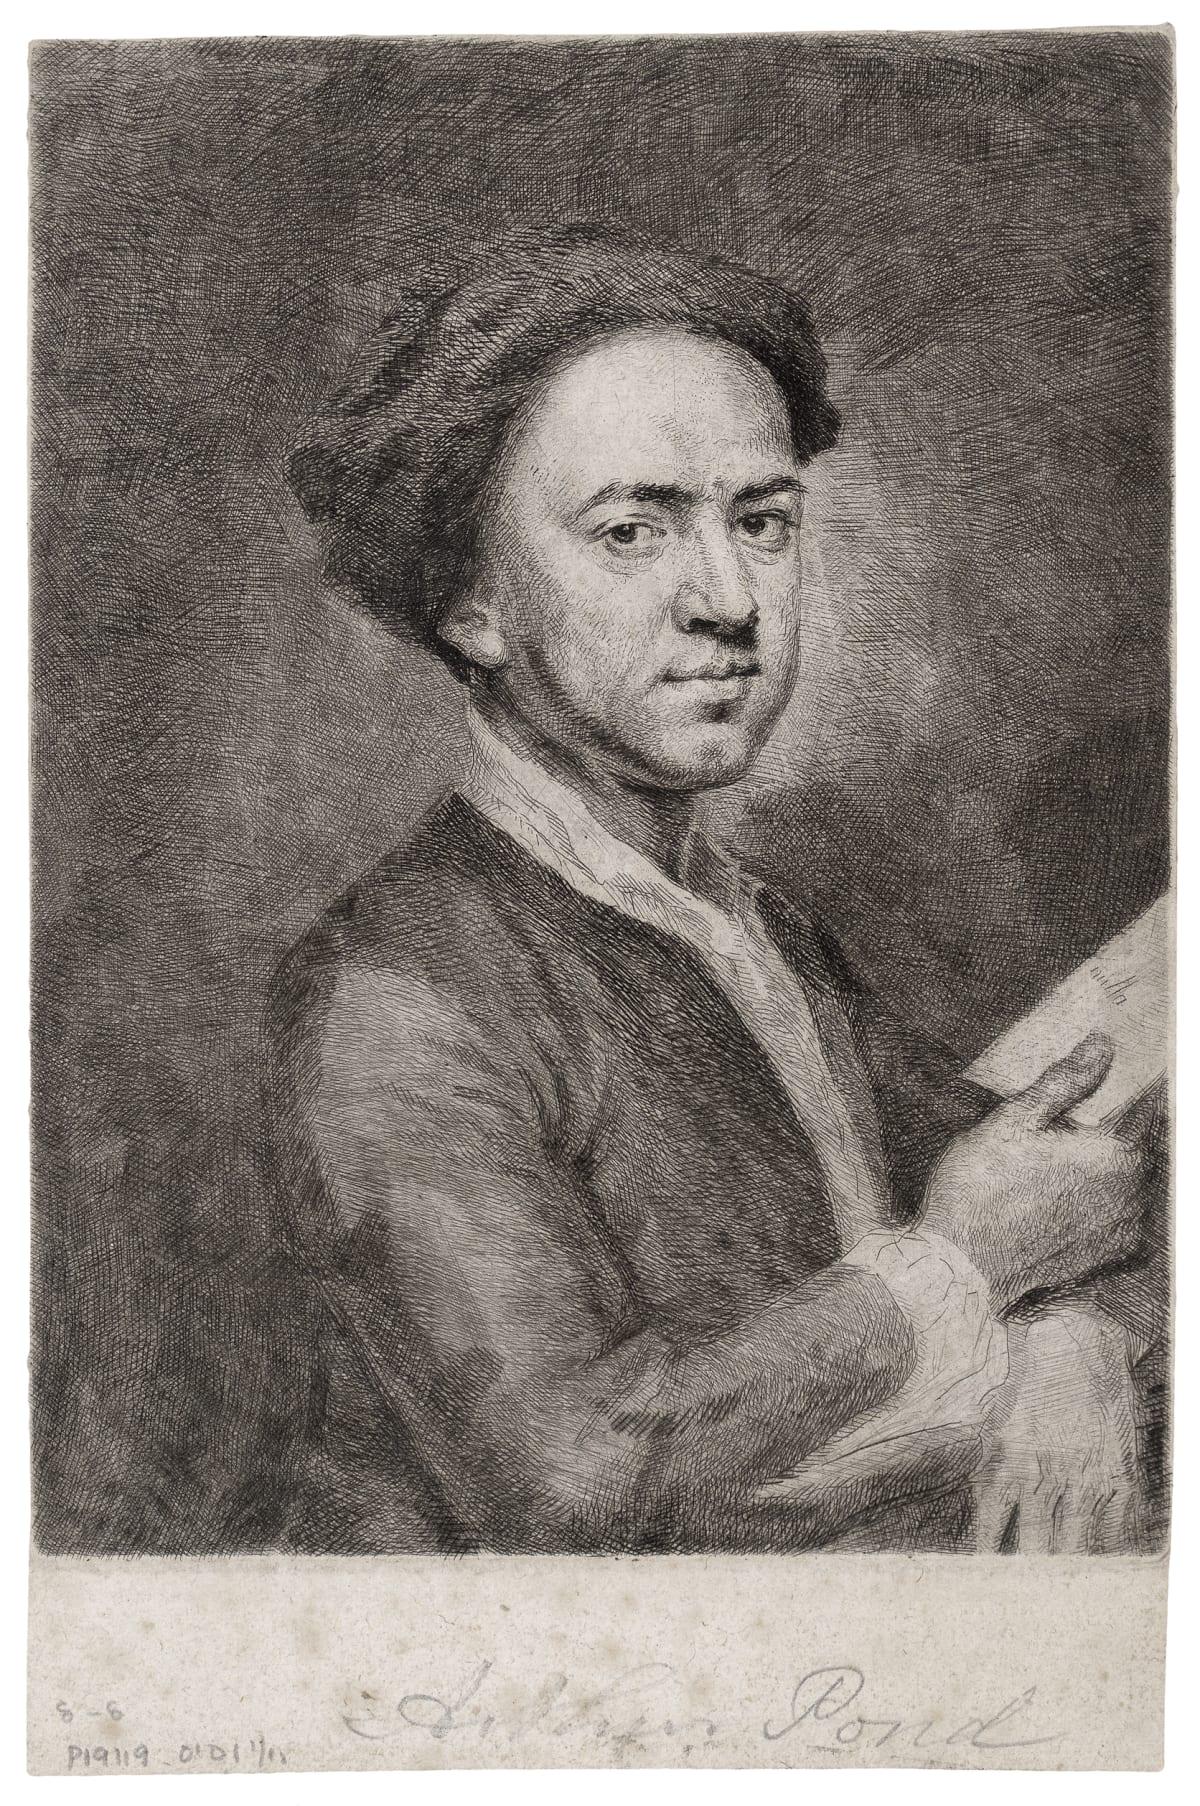 Arthur Pond Self-portrait, 1739 Etching. Size of sheet: 21.2 x 14 cm